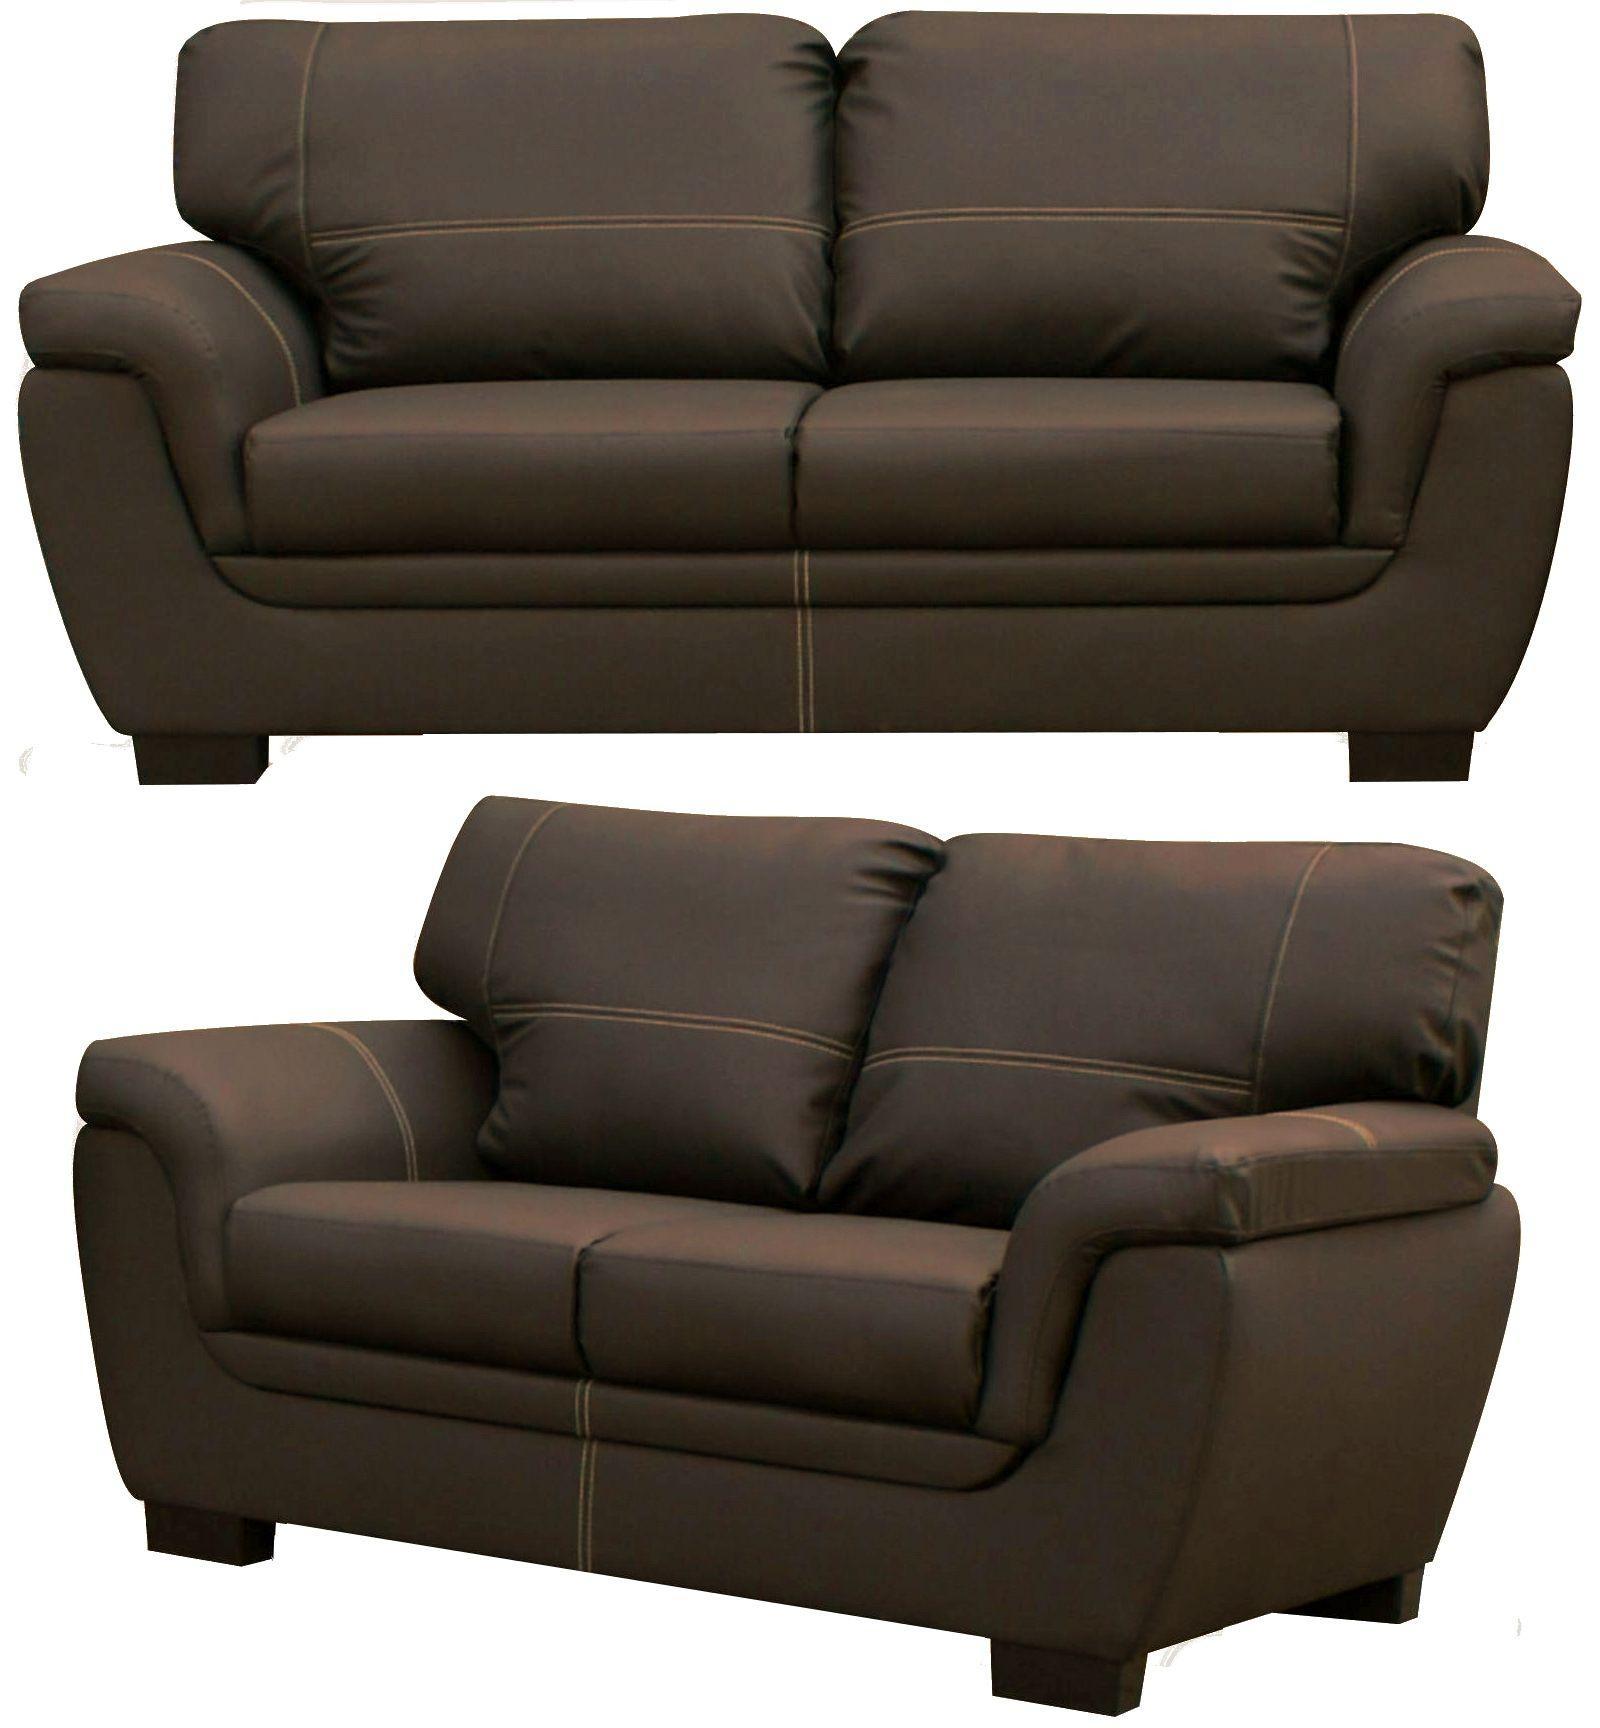 Sealy Leather Sofa